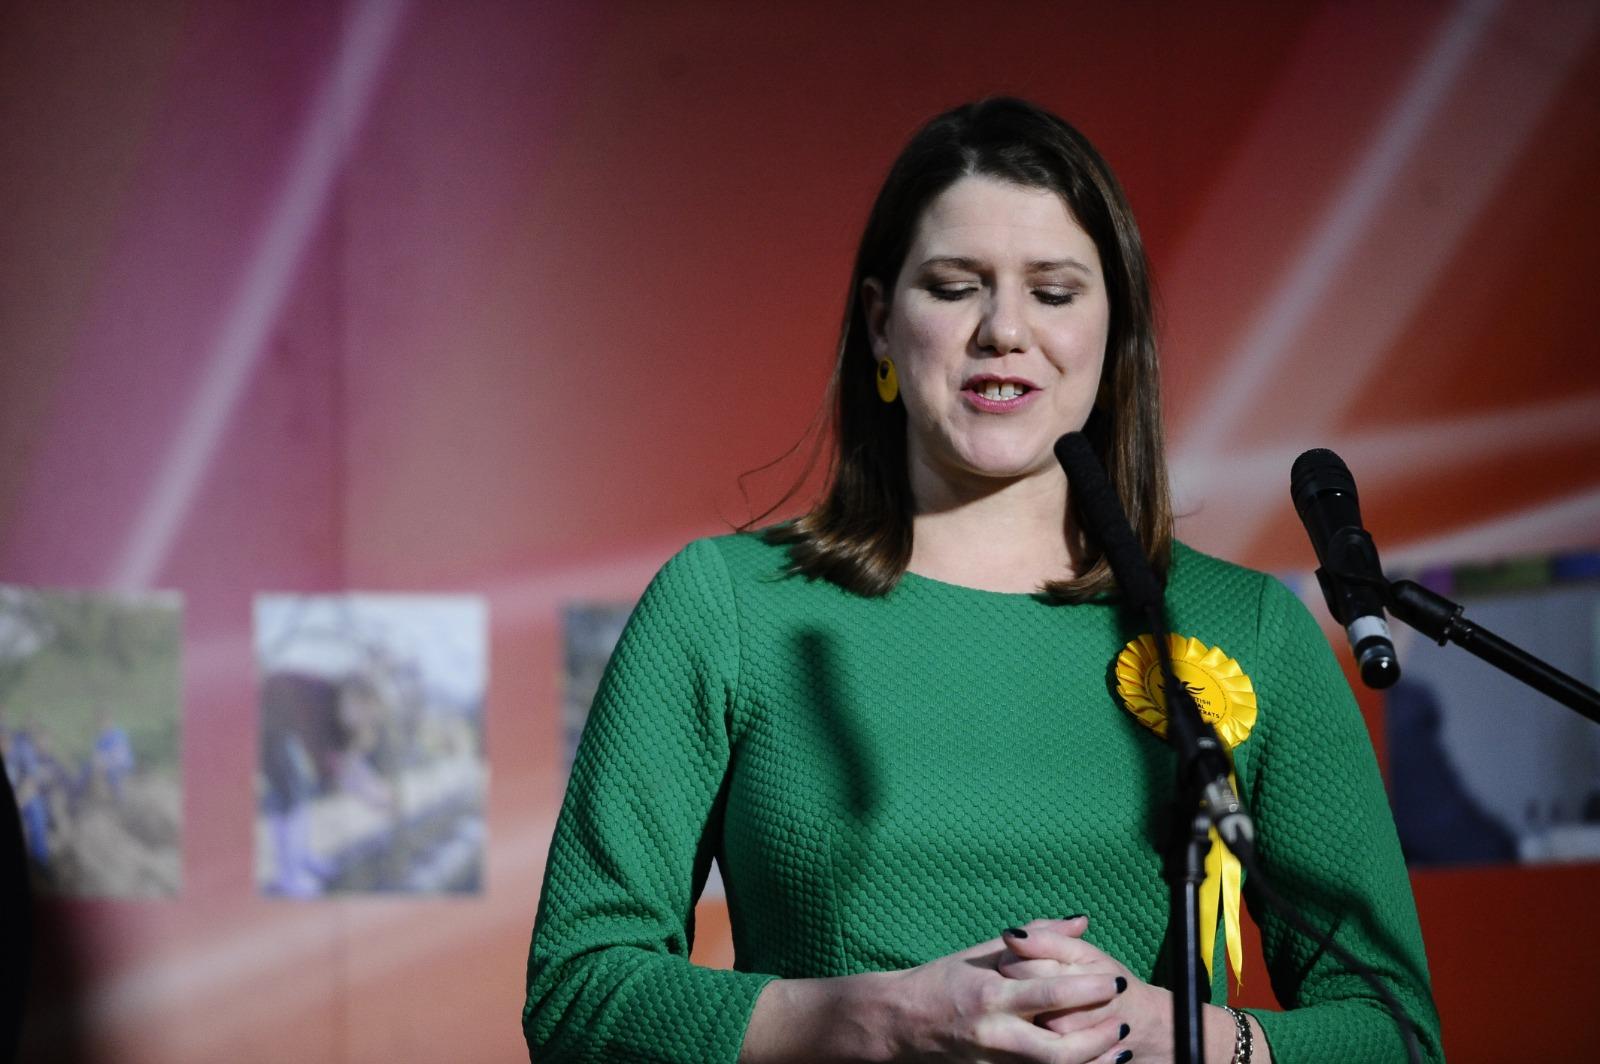 Jo Swinson resigns as Lib Dem leader after losing her seat